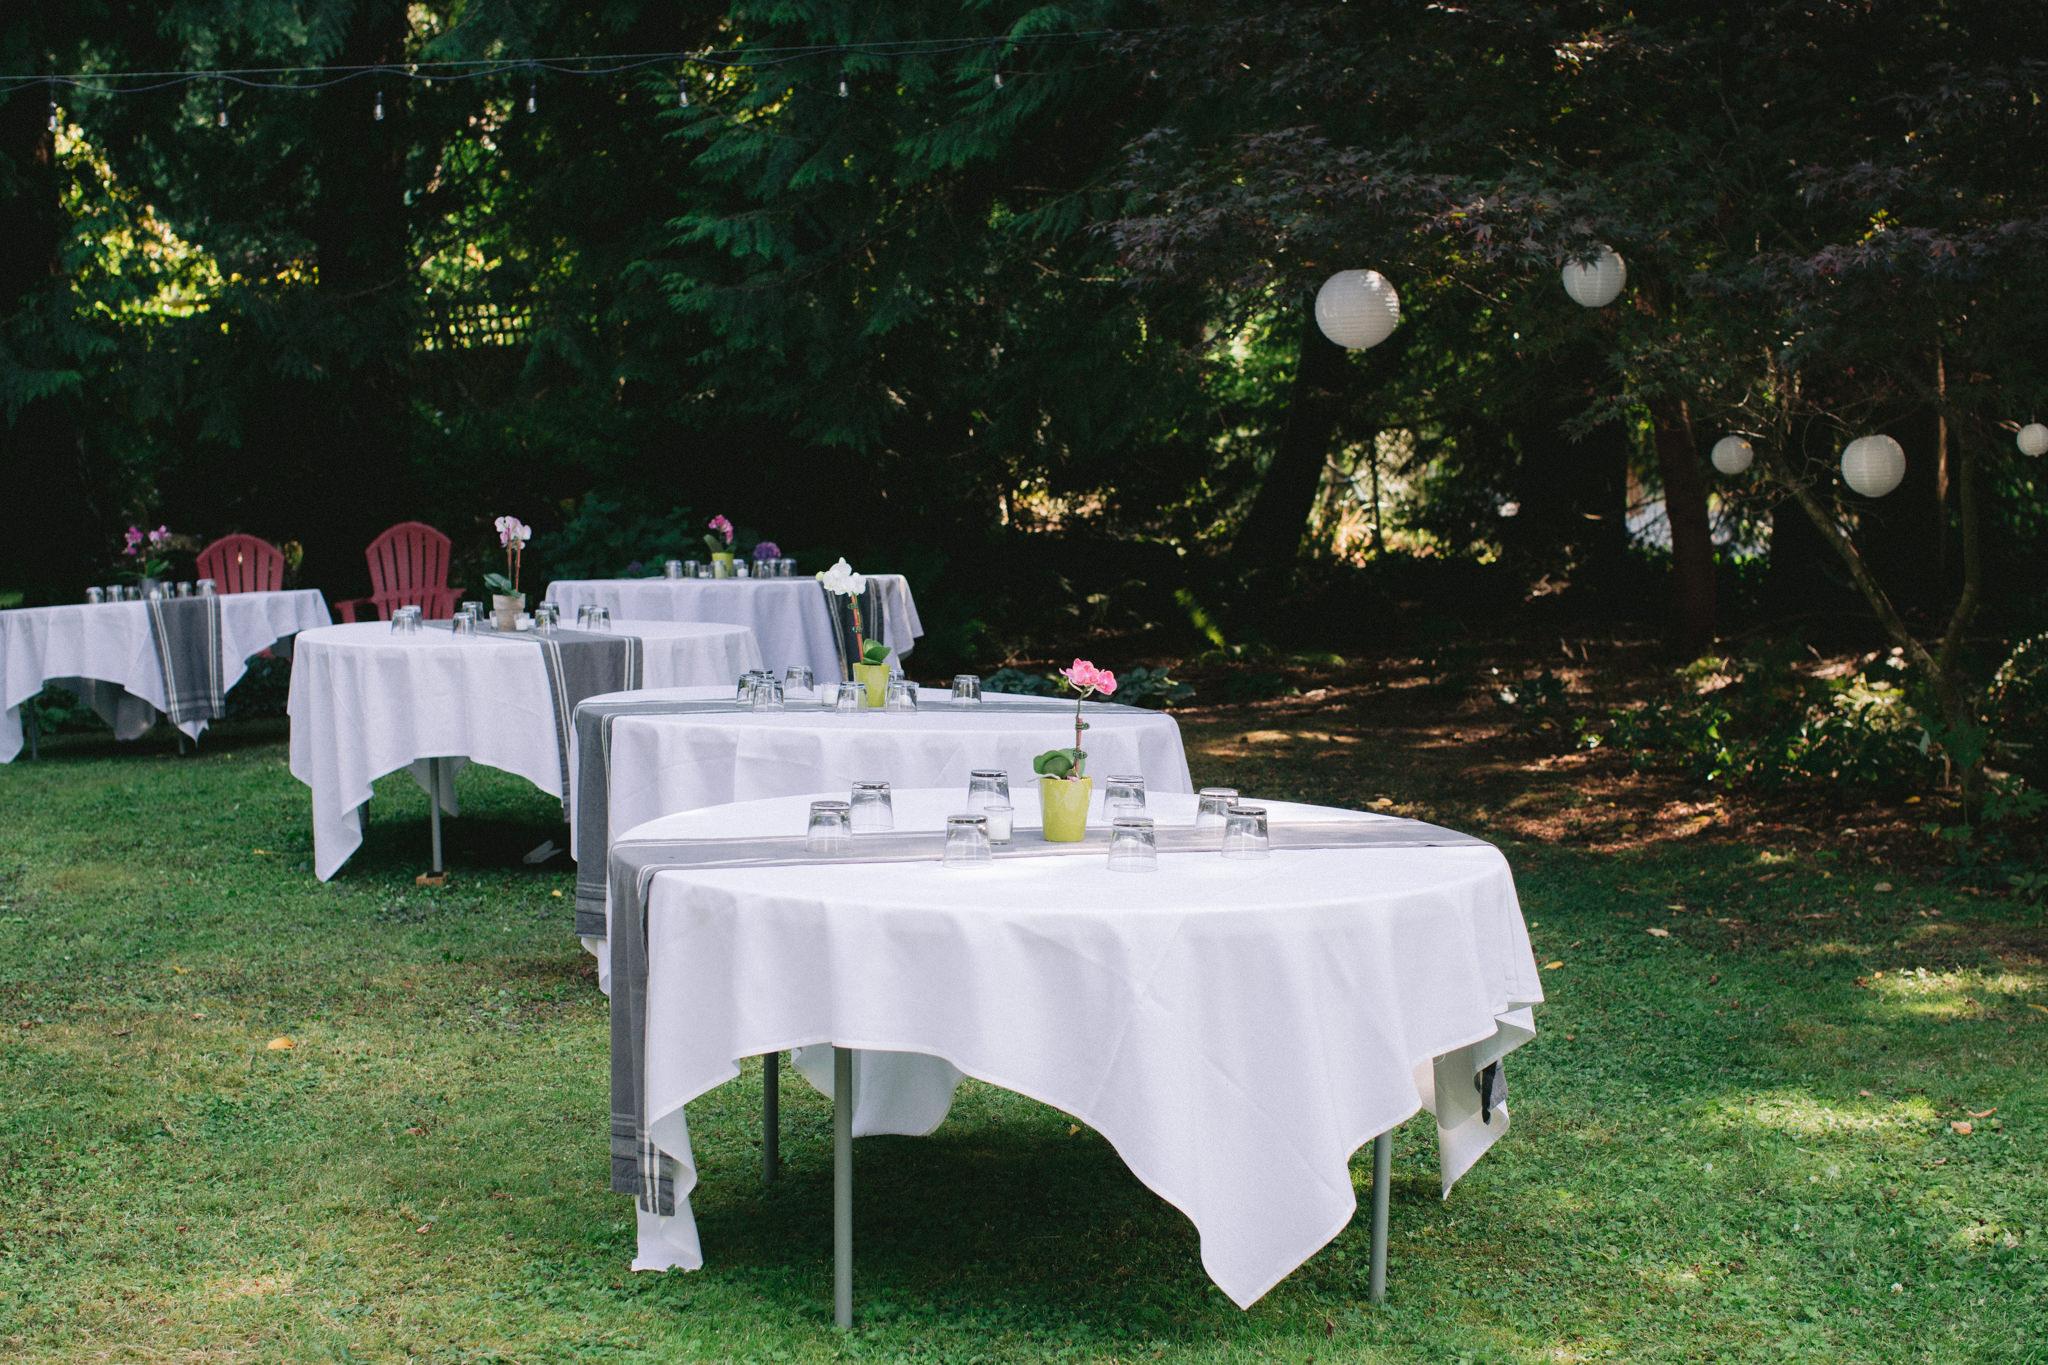 Backyard-Bainbridge-Island-Wedding-Alycia-Lovell-Photography-65.JPG